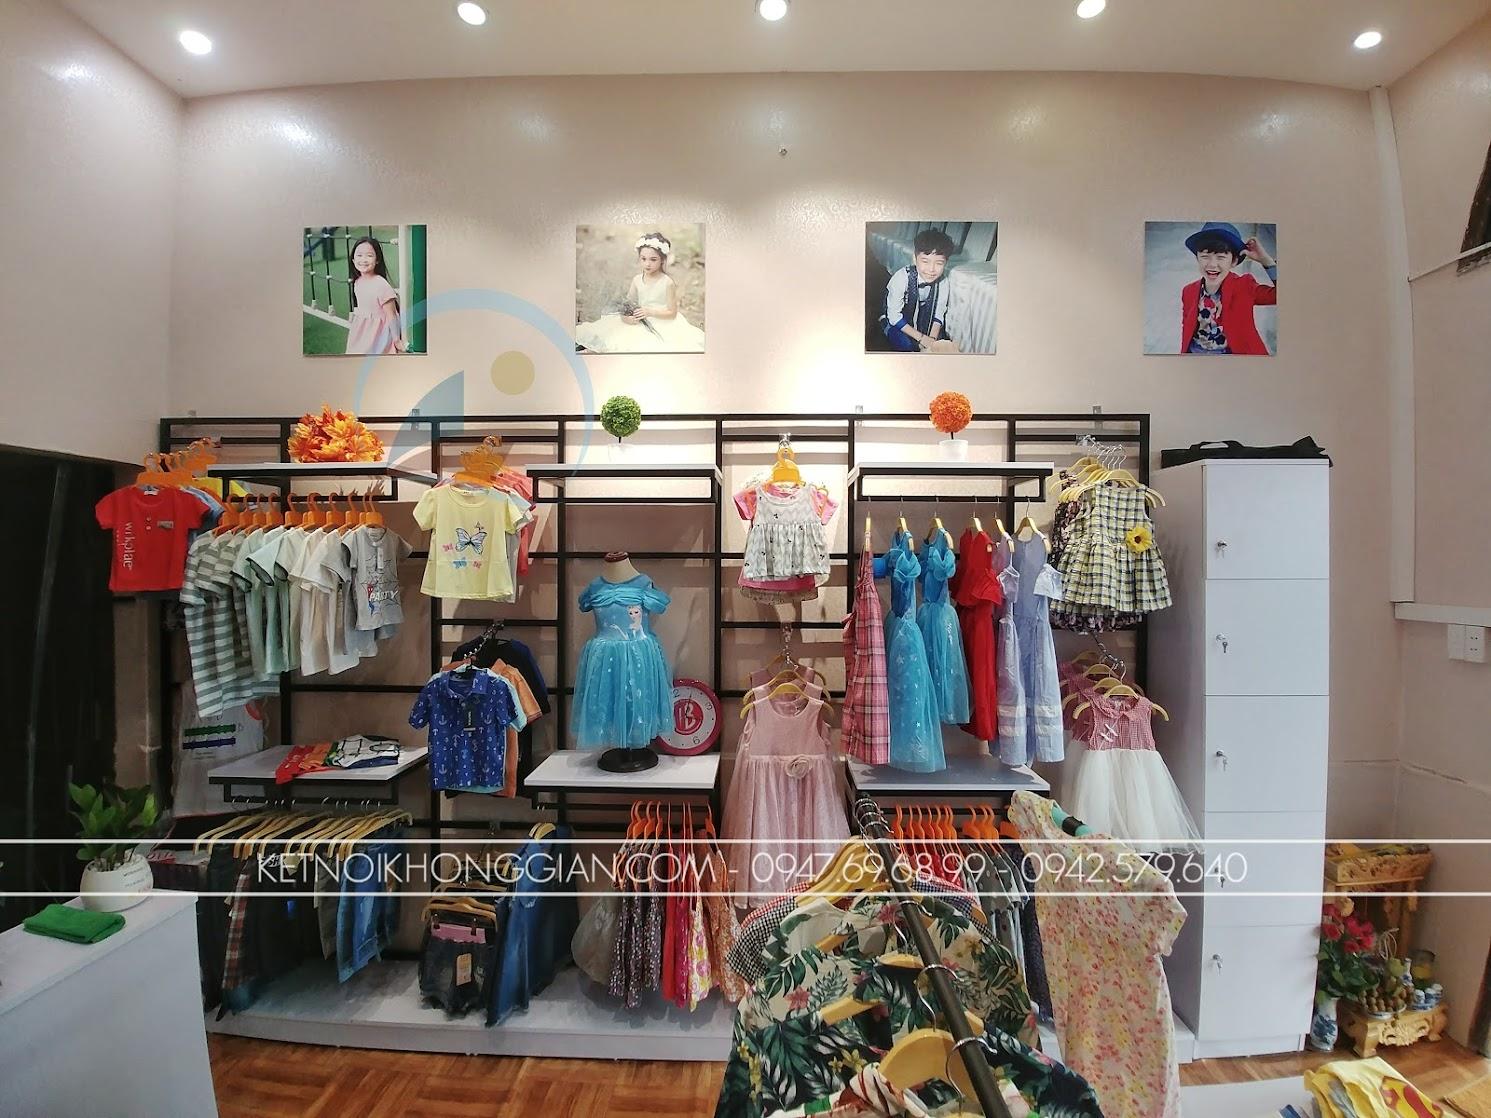 thiết kế shop thời trang 2